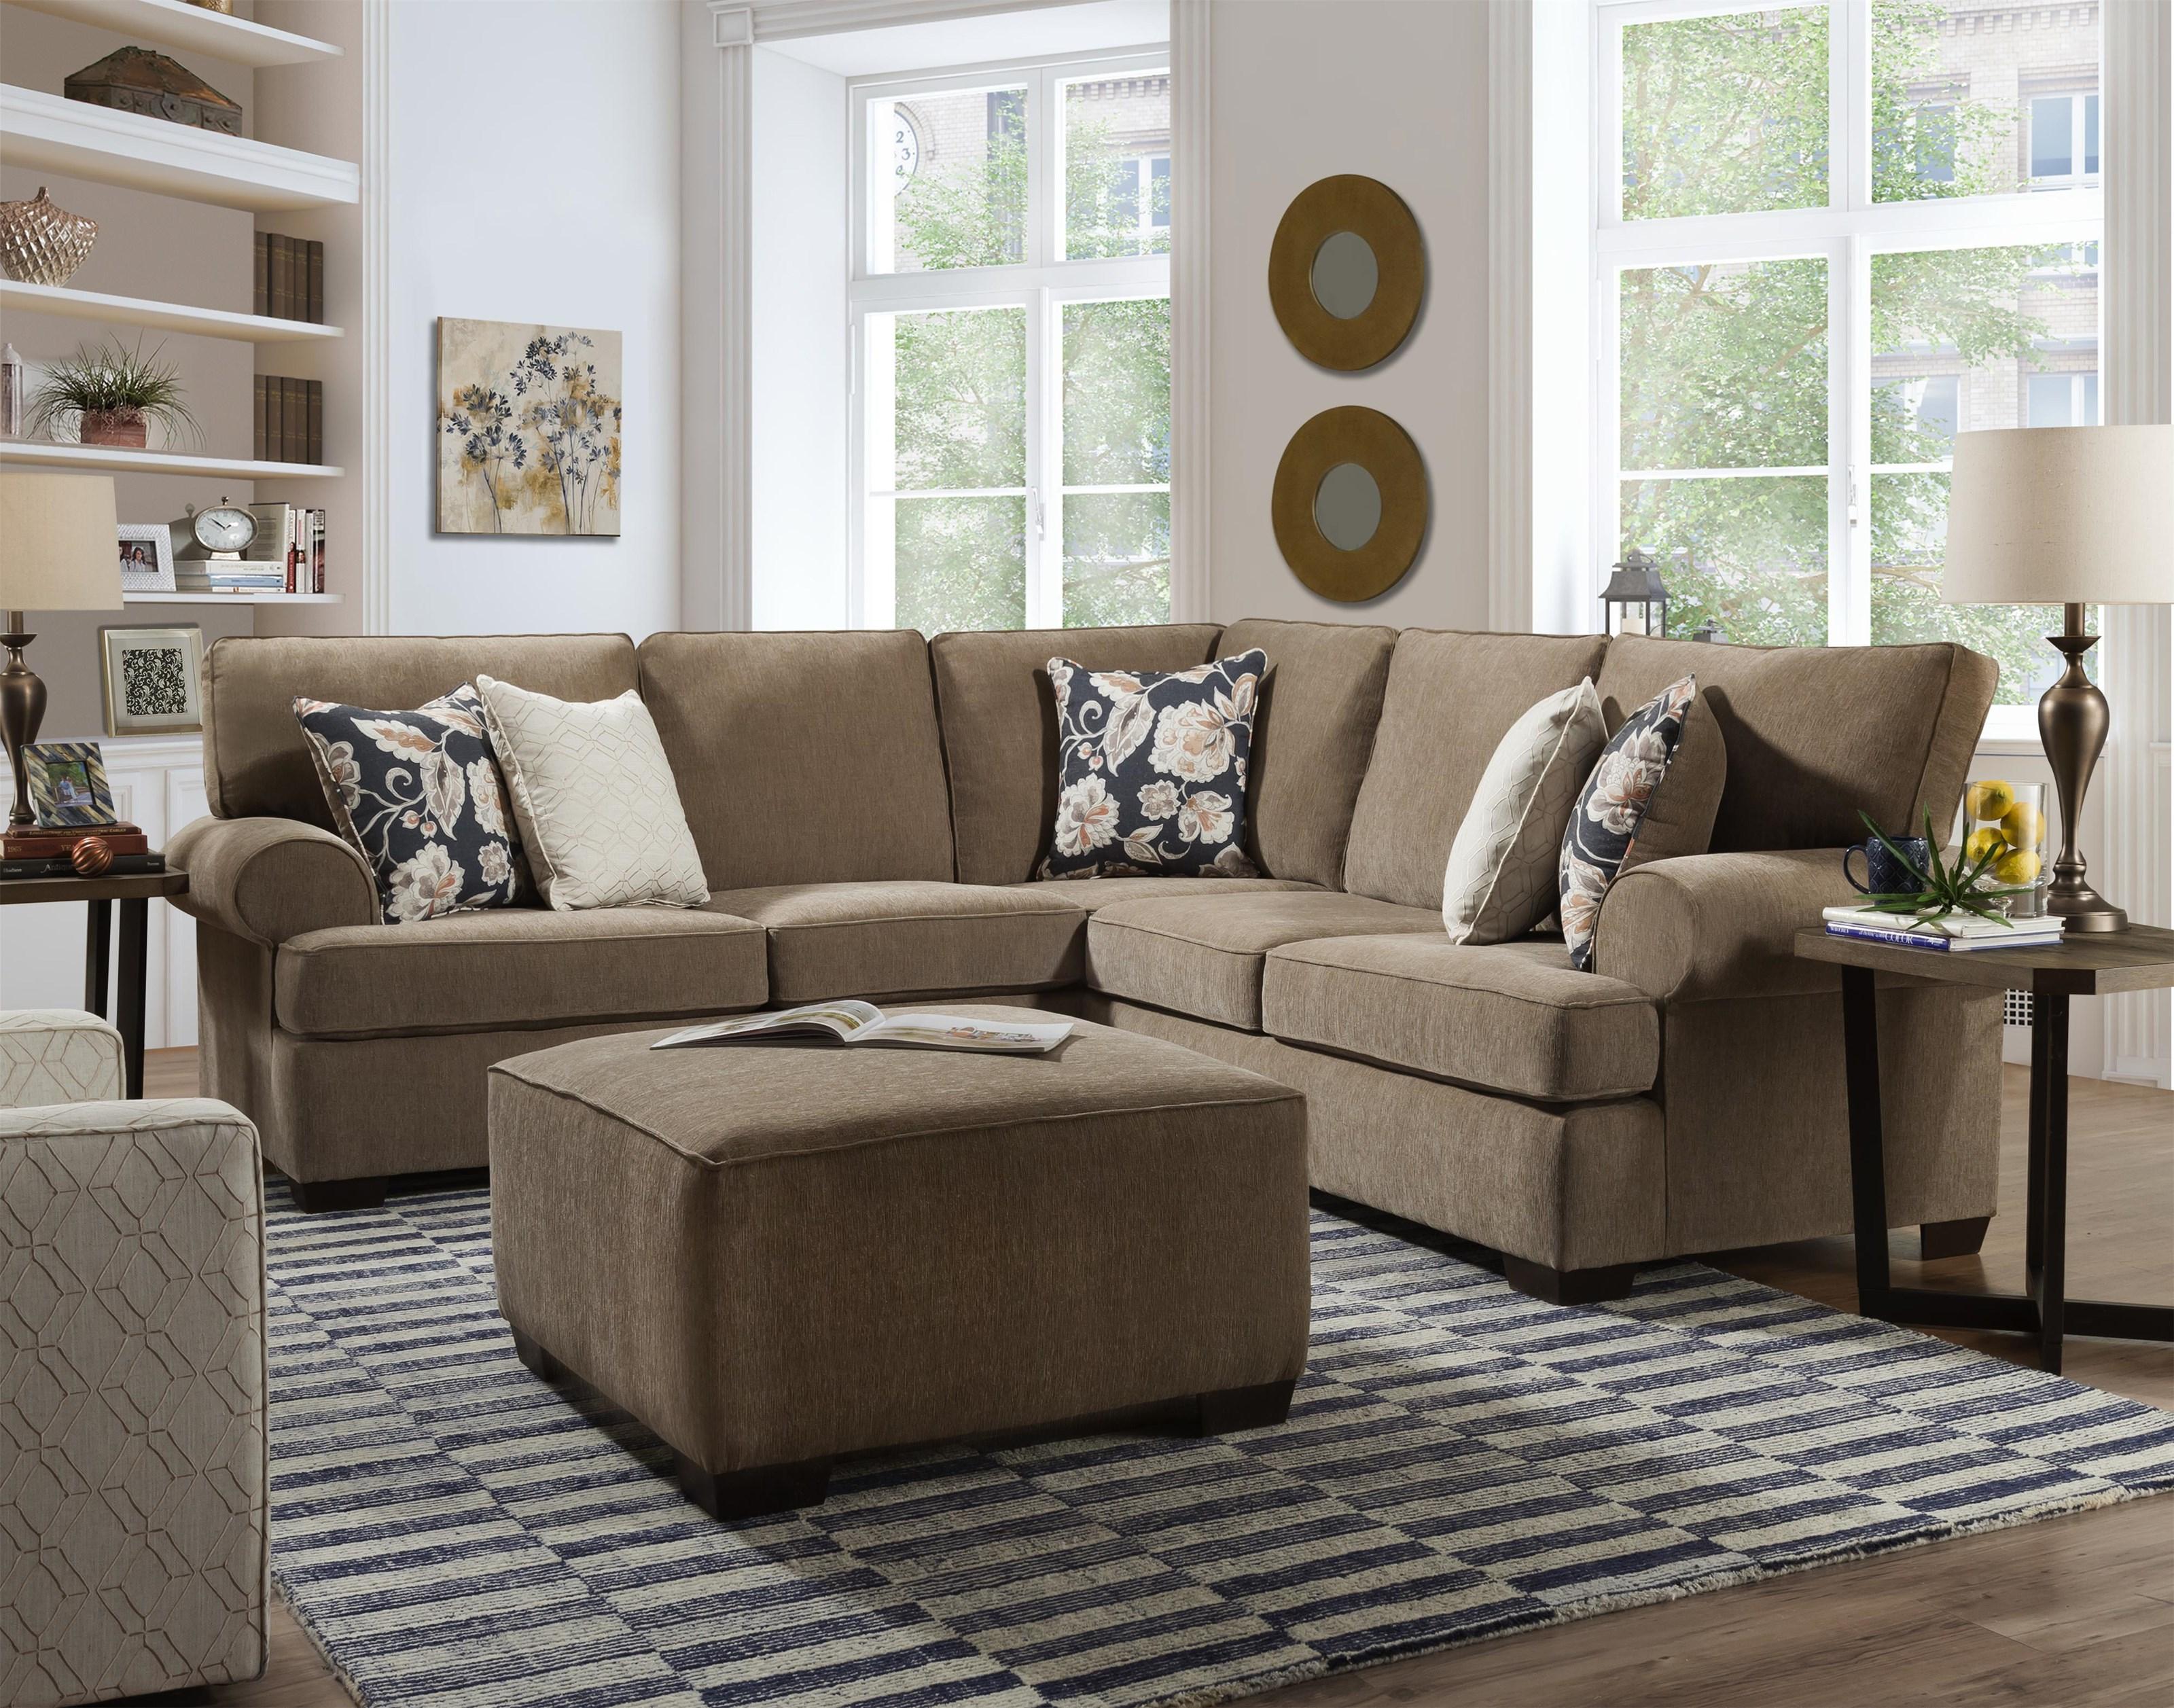 Byron Byron Sectional Sofa by Peak Living at Morris Home